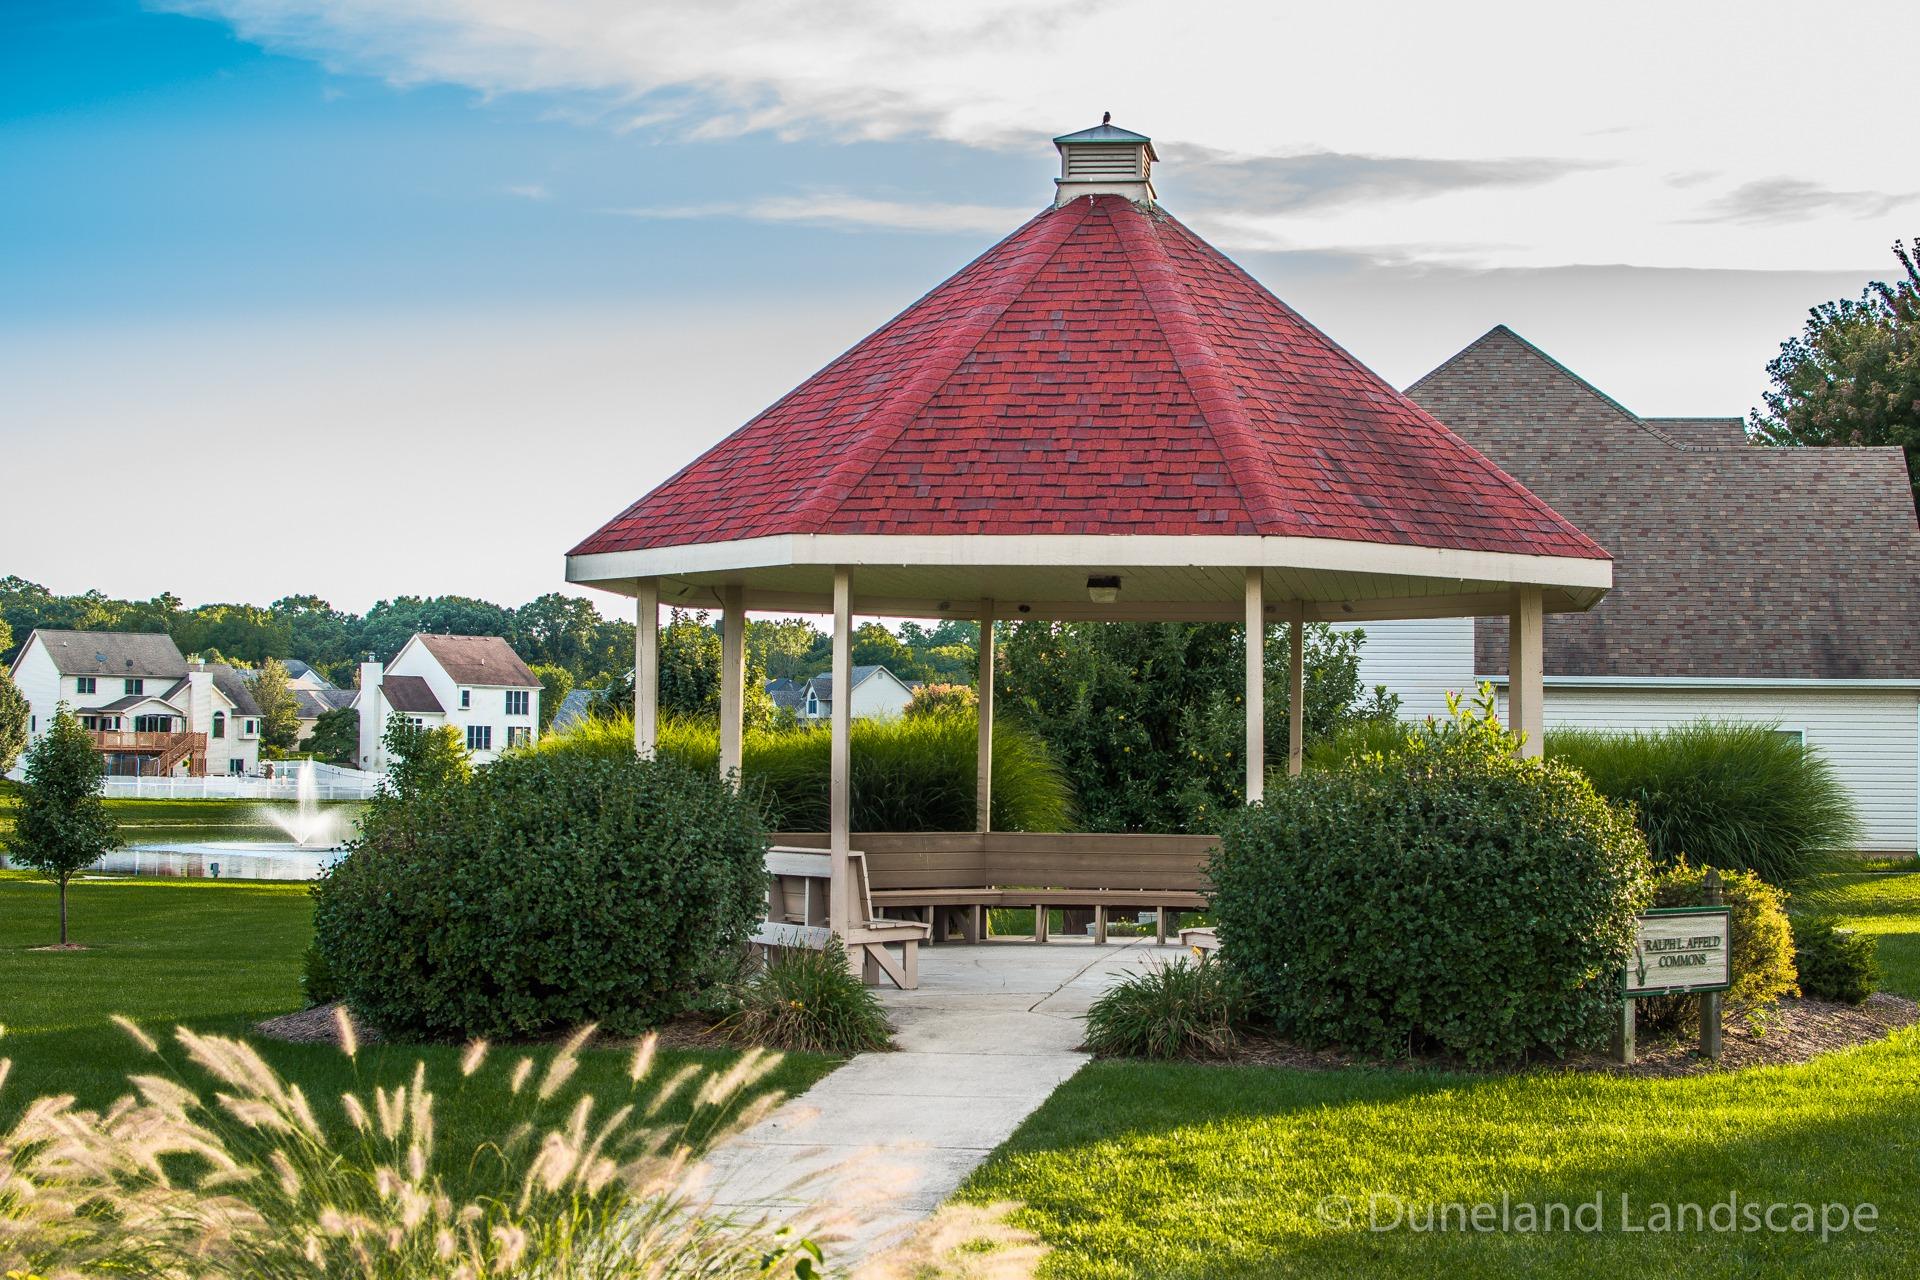 Landscaping design for Indiana park